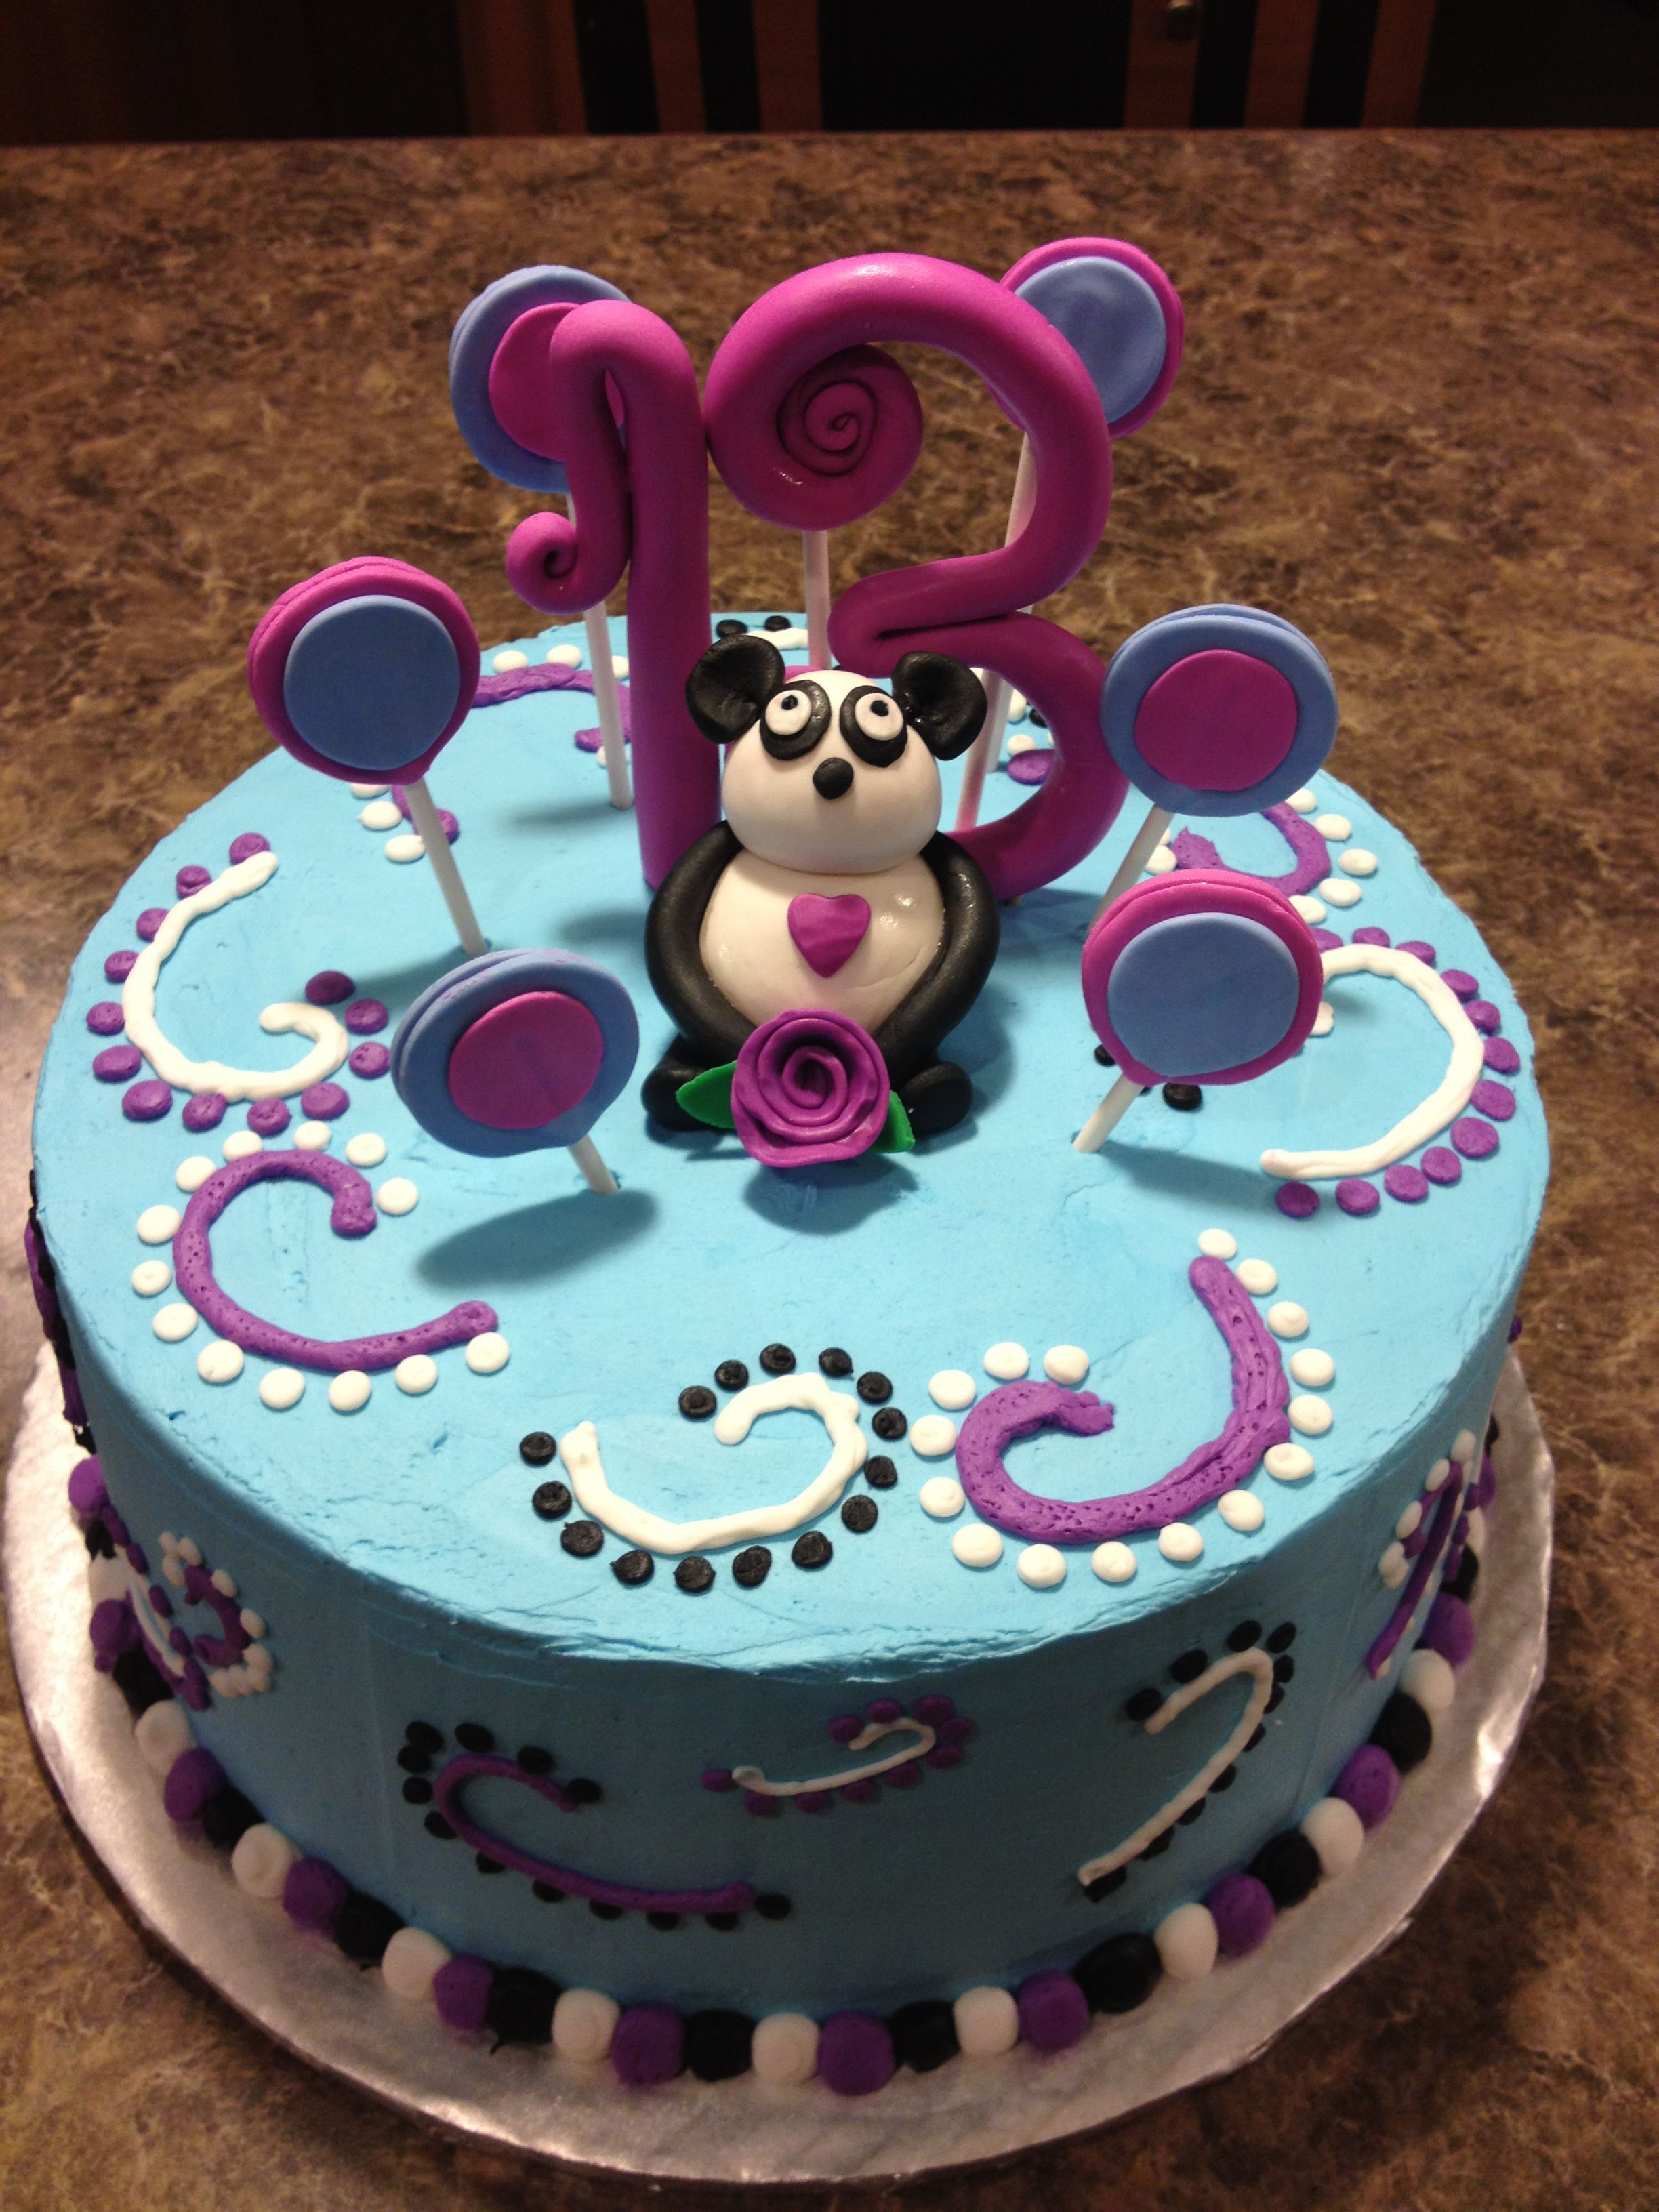 Panda Bear Cake Sweet November Cakes Pinterest